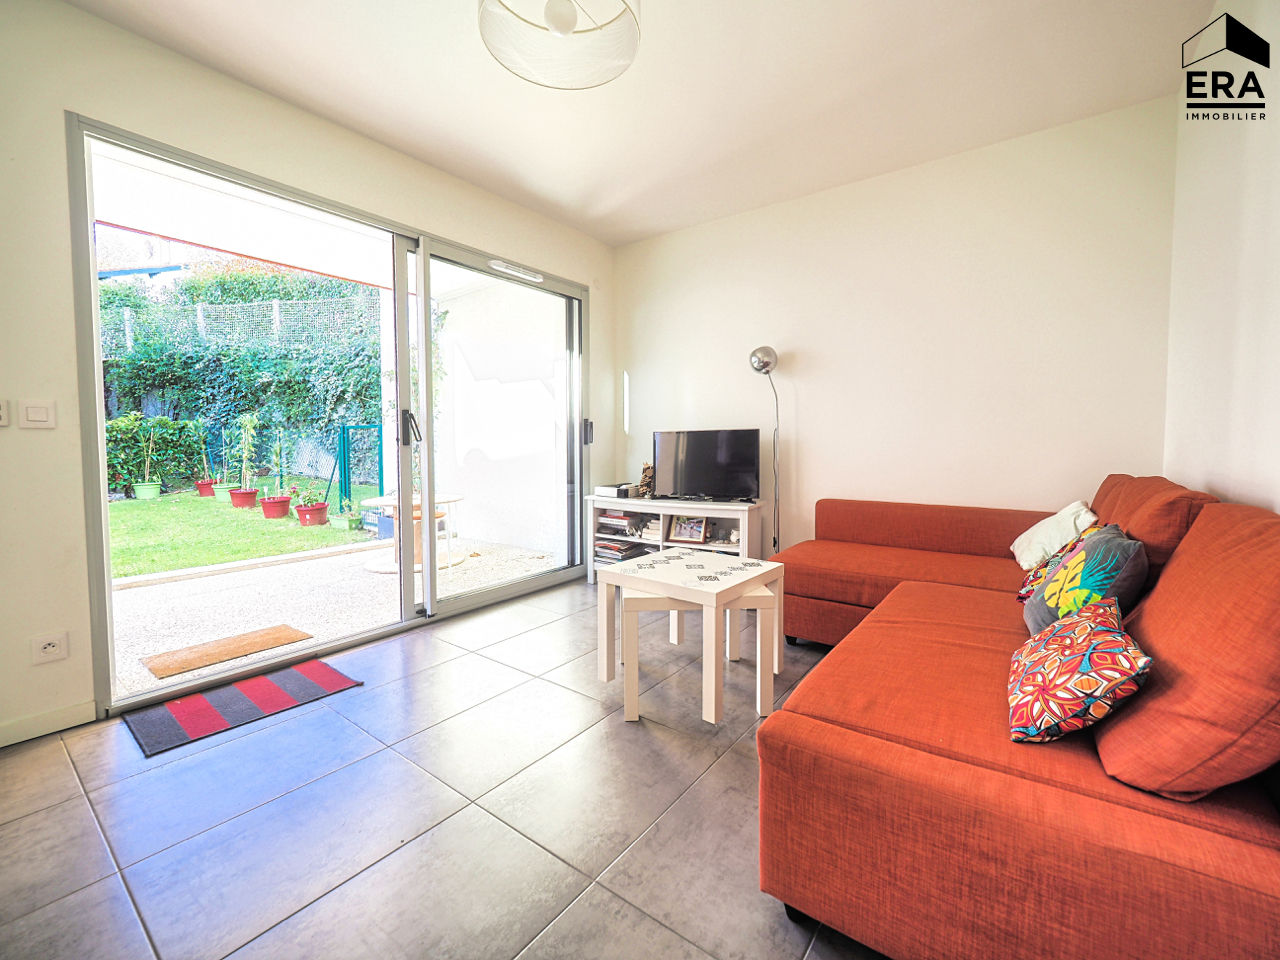 vente appartement à CIBOURE - 255 300